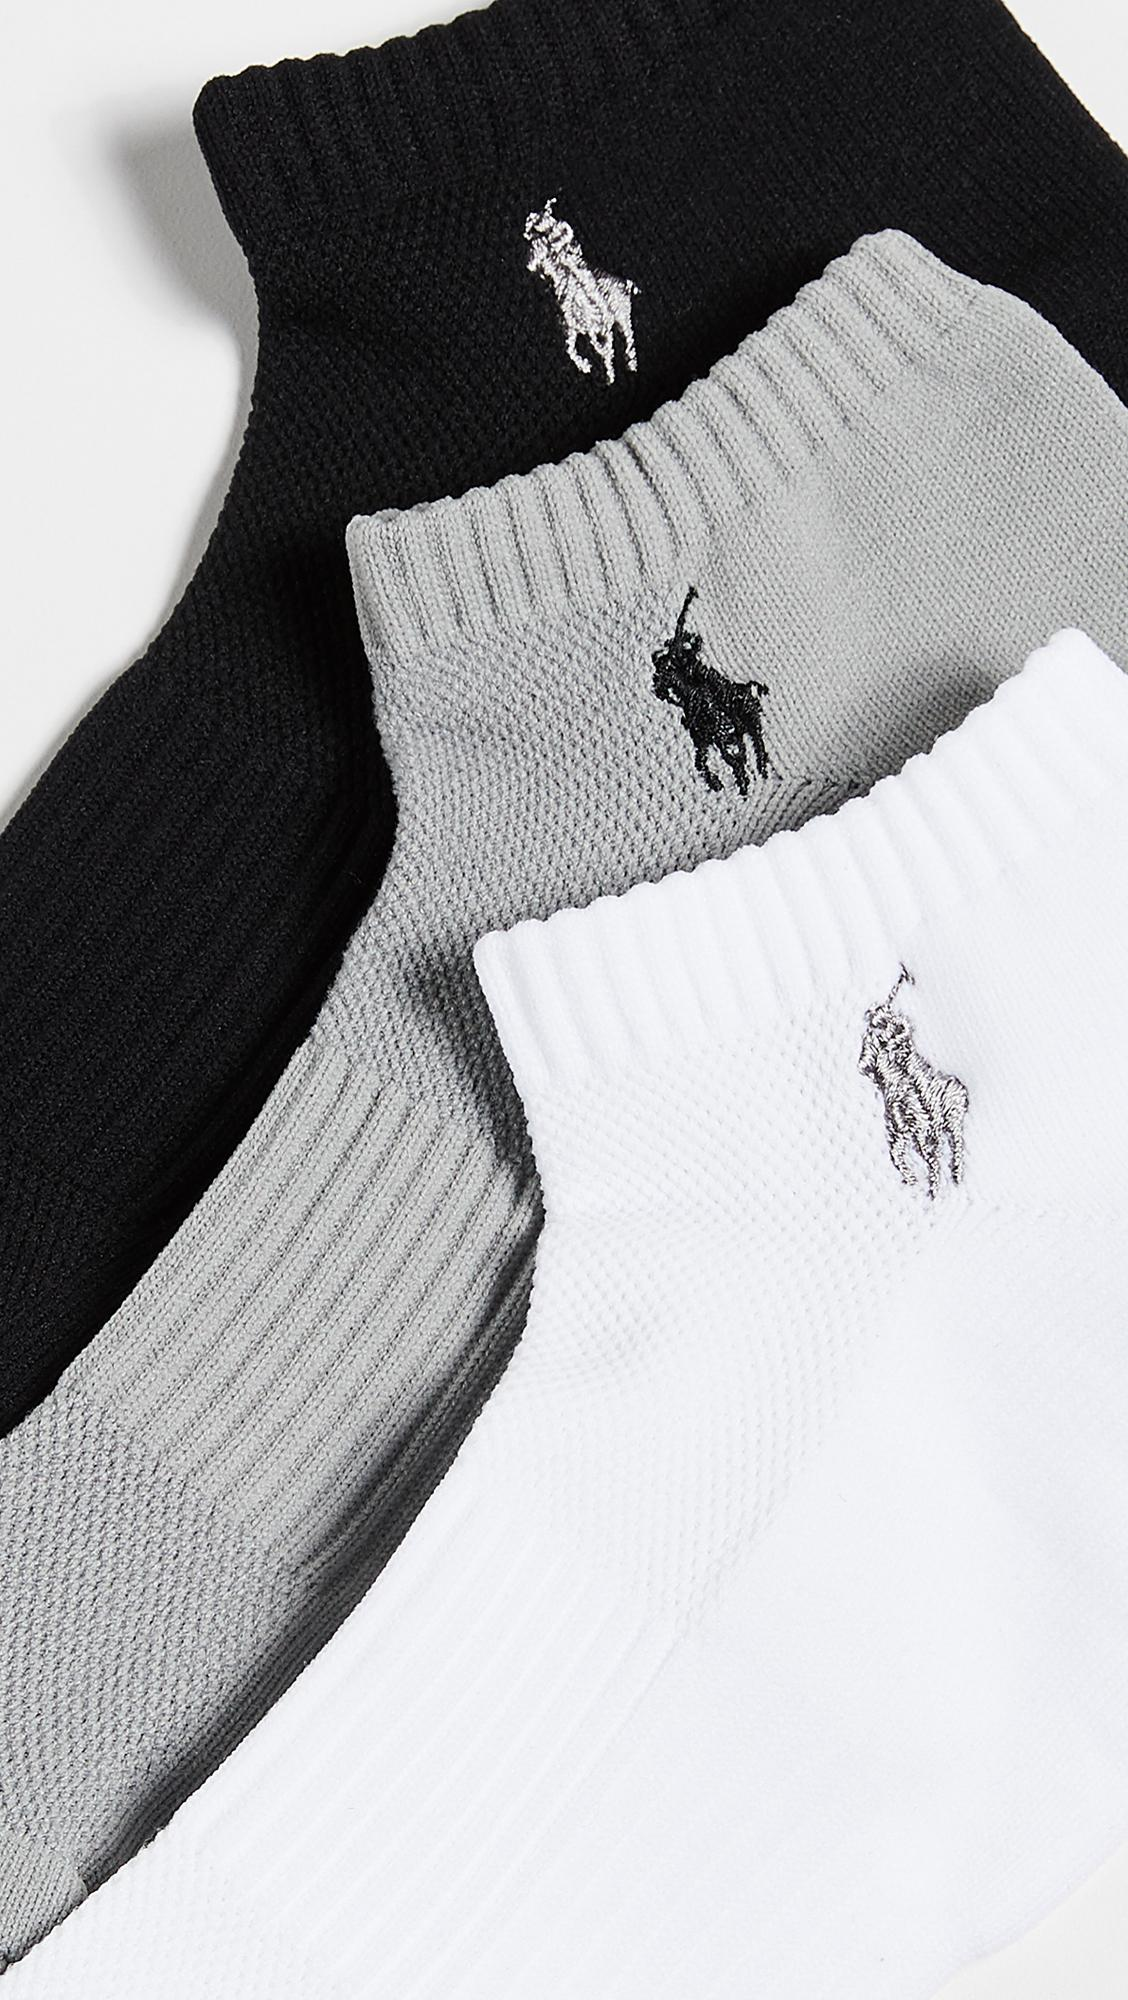 12a89c53e8ef4 Lyst - Polo Ralph Lauren 3 Pack Tech Athletic Low Cut Socks in Black ...